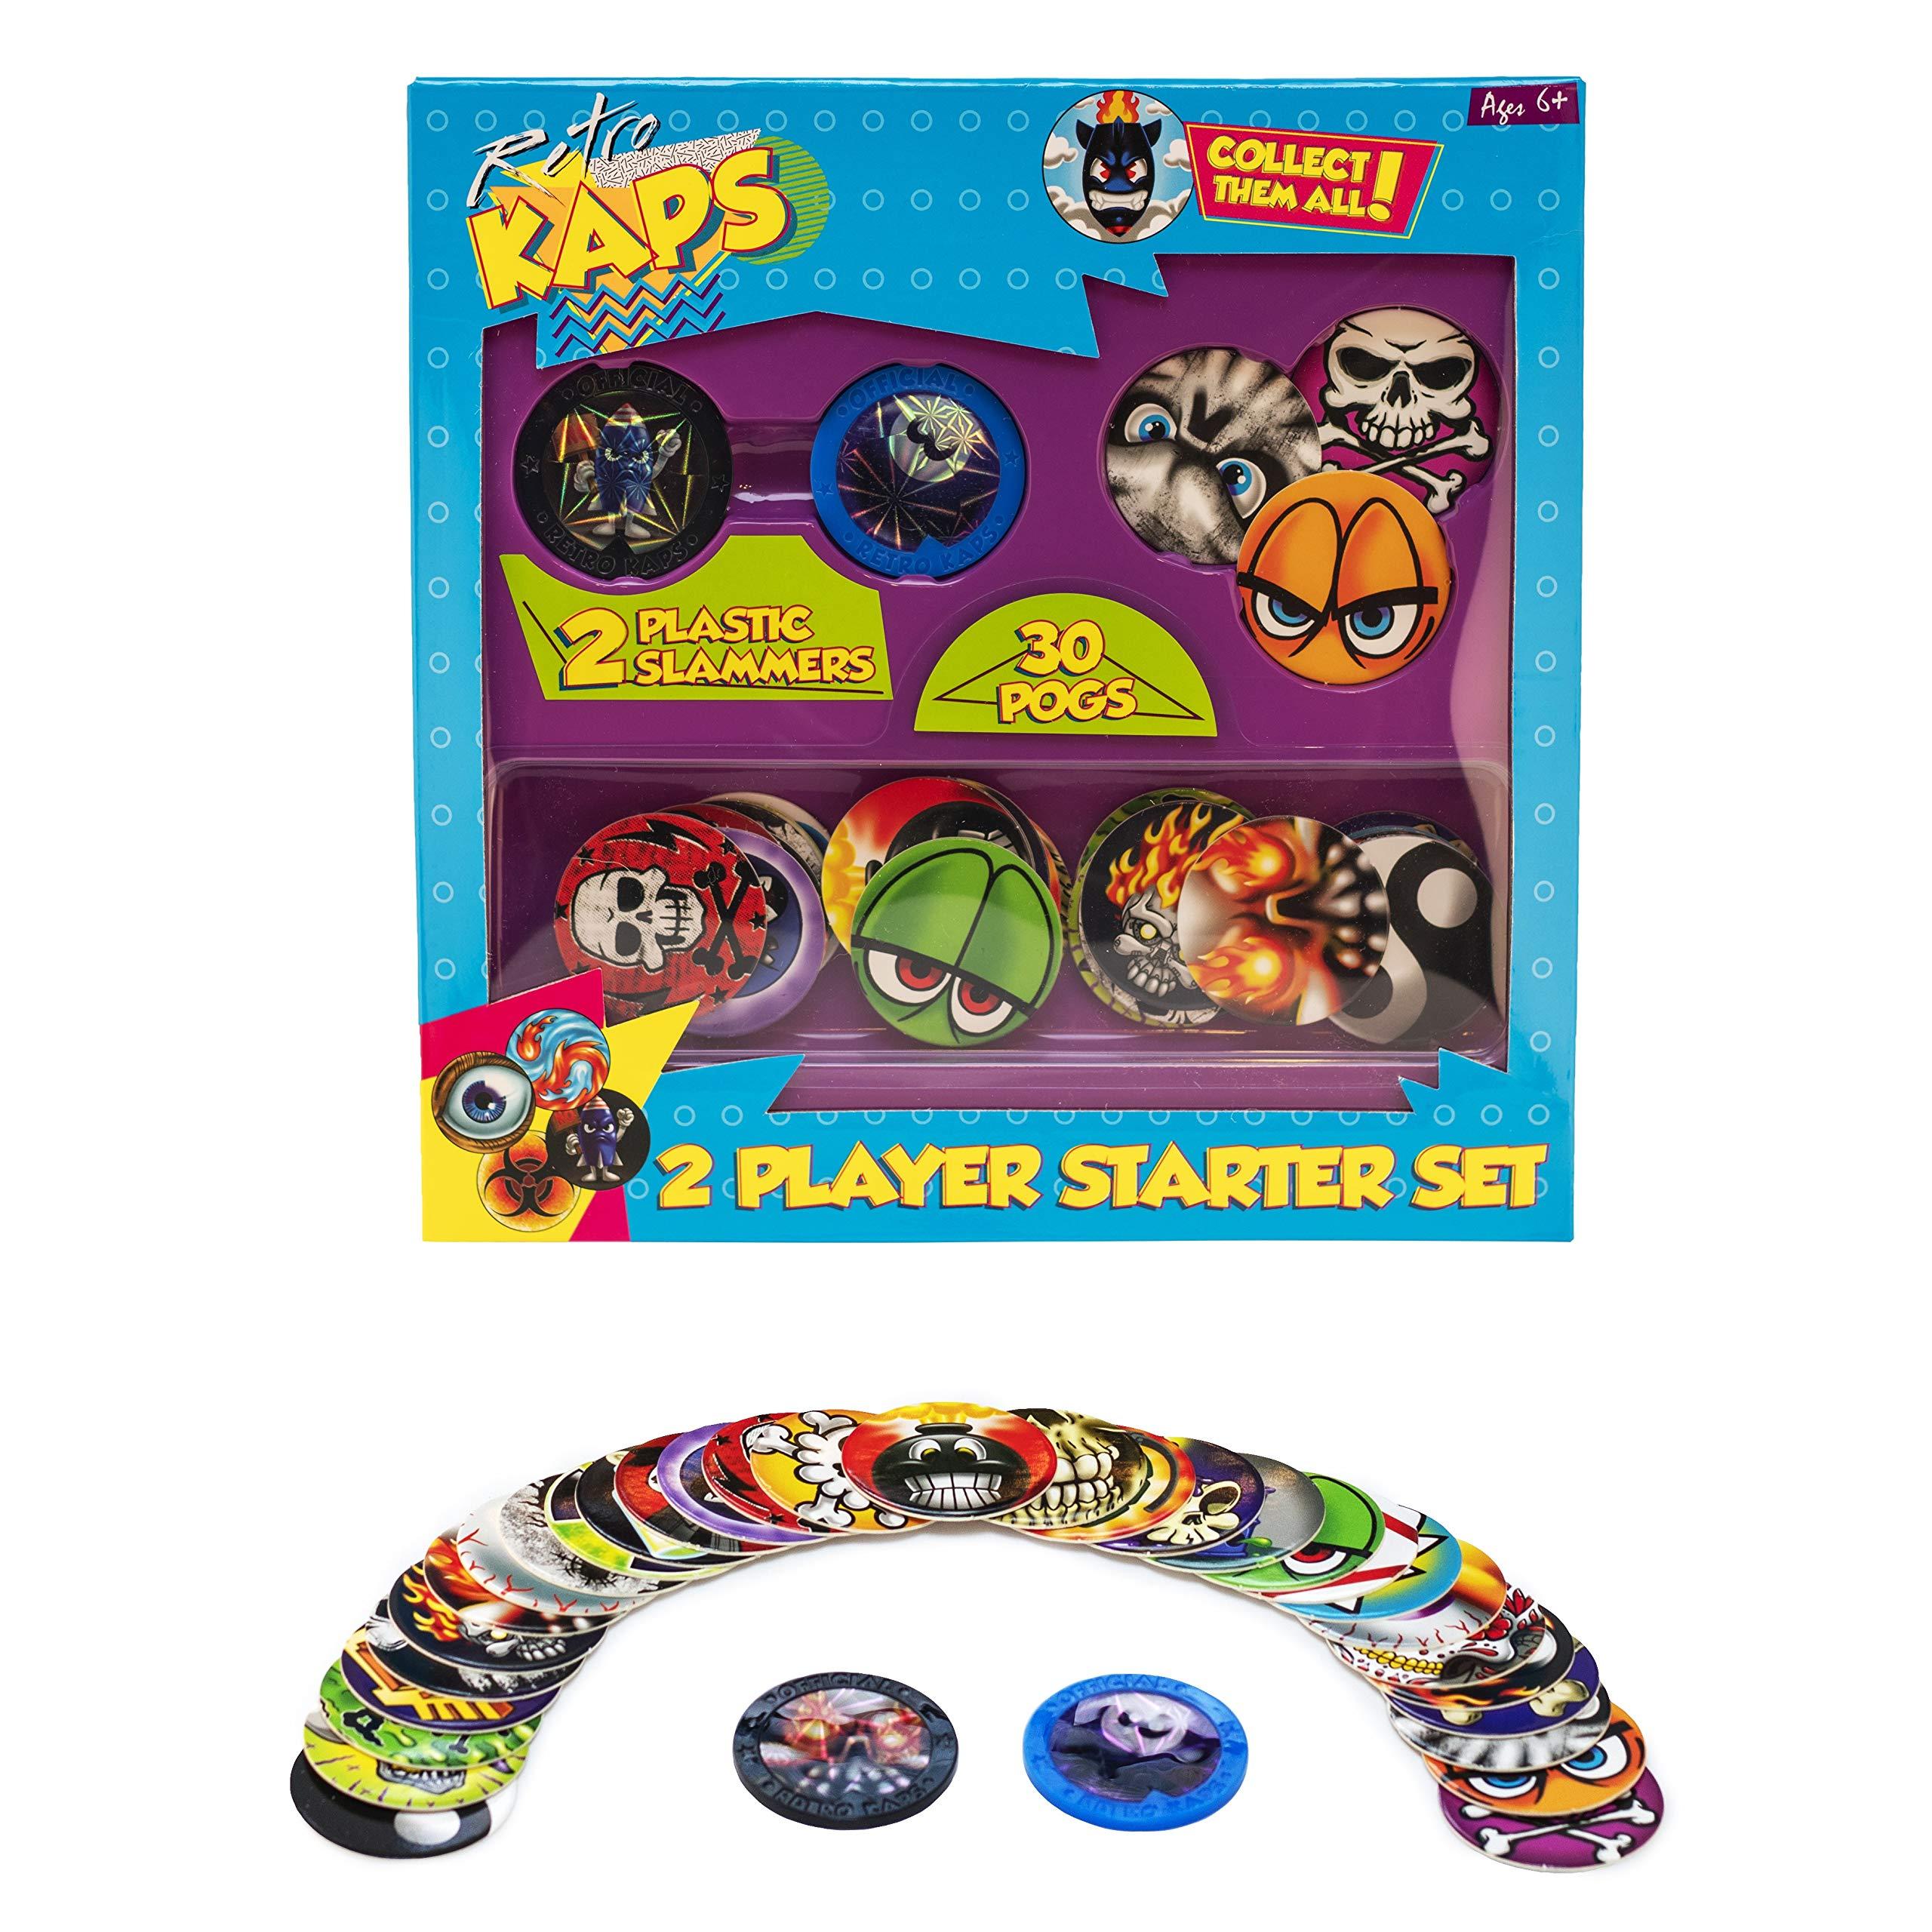 Pog Retro Kaps 2-Player Starter Set Game Includes: 30 Pogs & 2 Slammers by Pog Retro Kaps